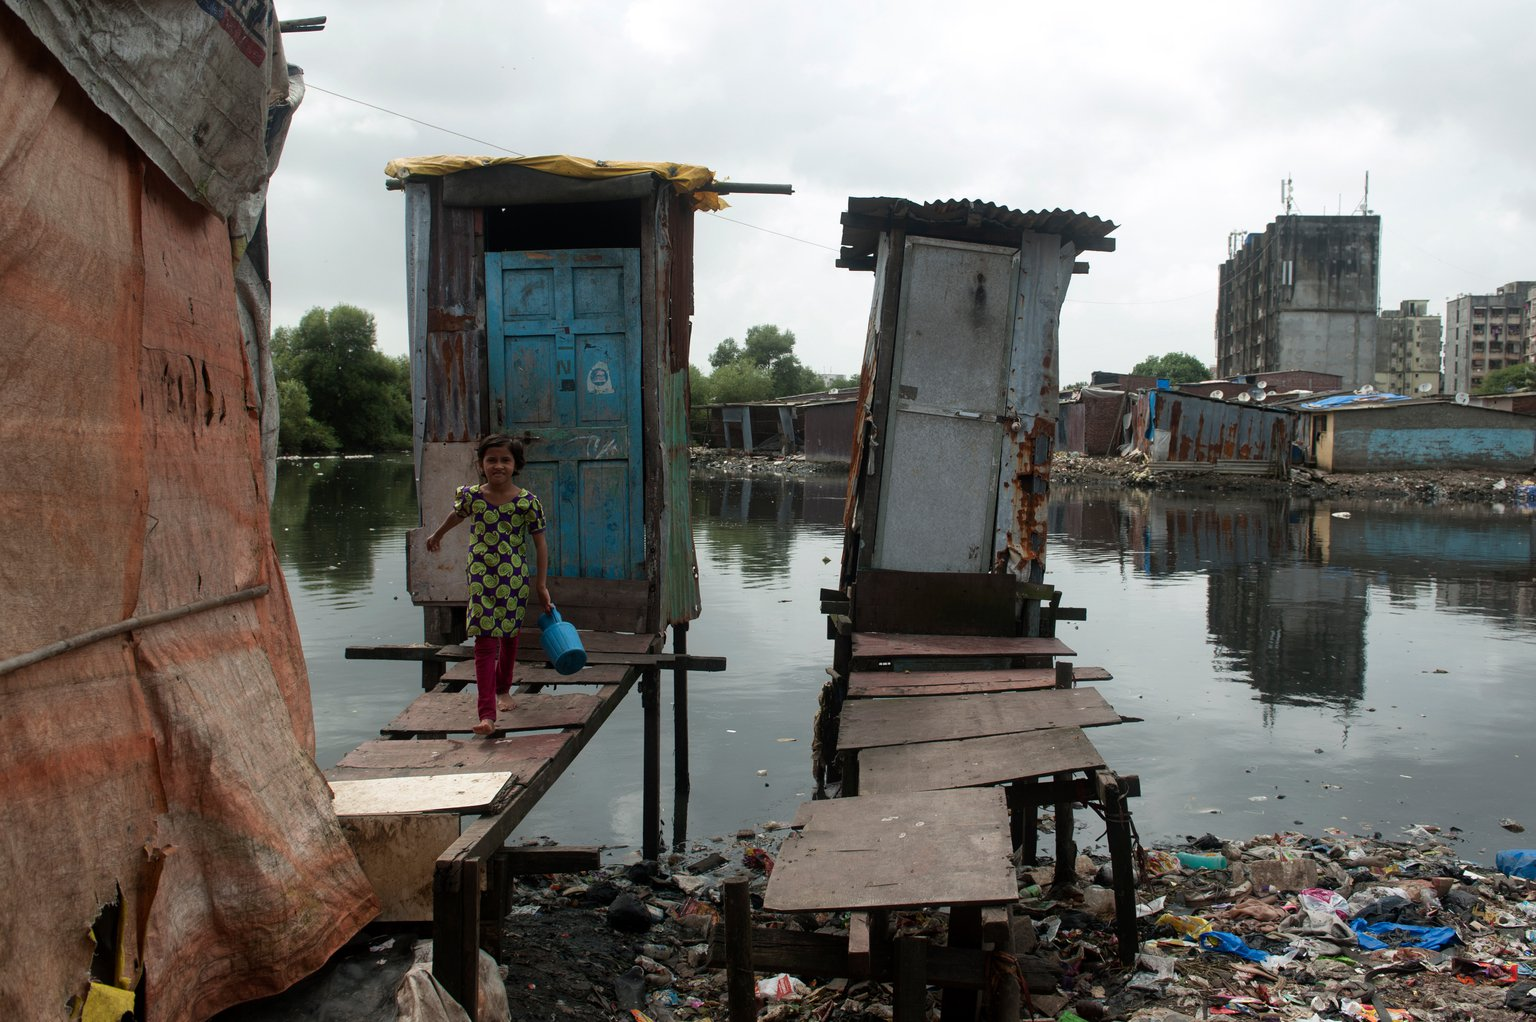 Toilets-Around-The-World-India.jpg